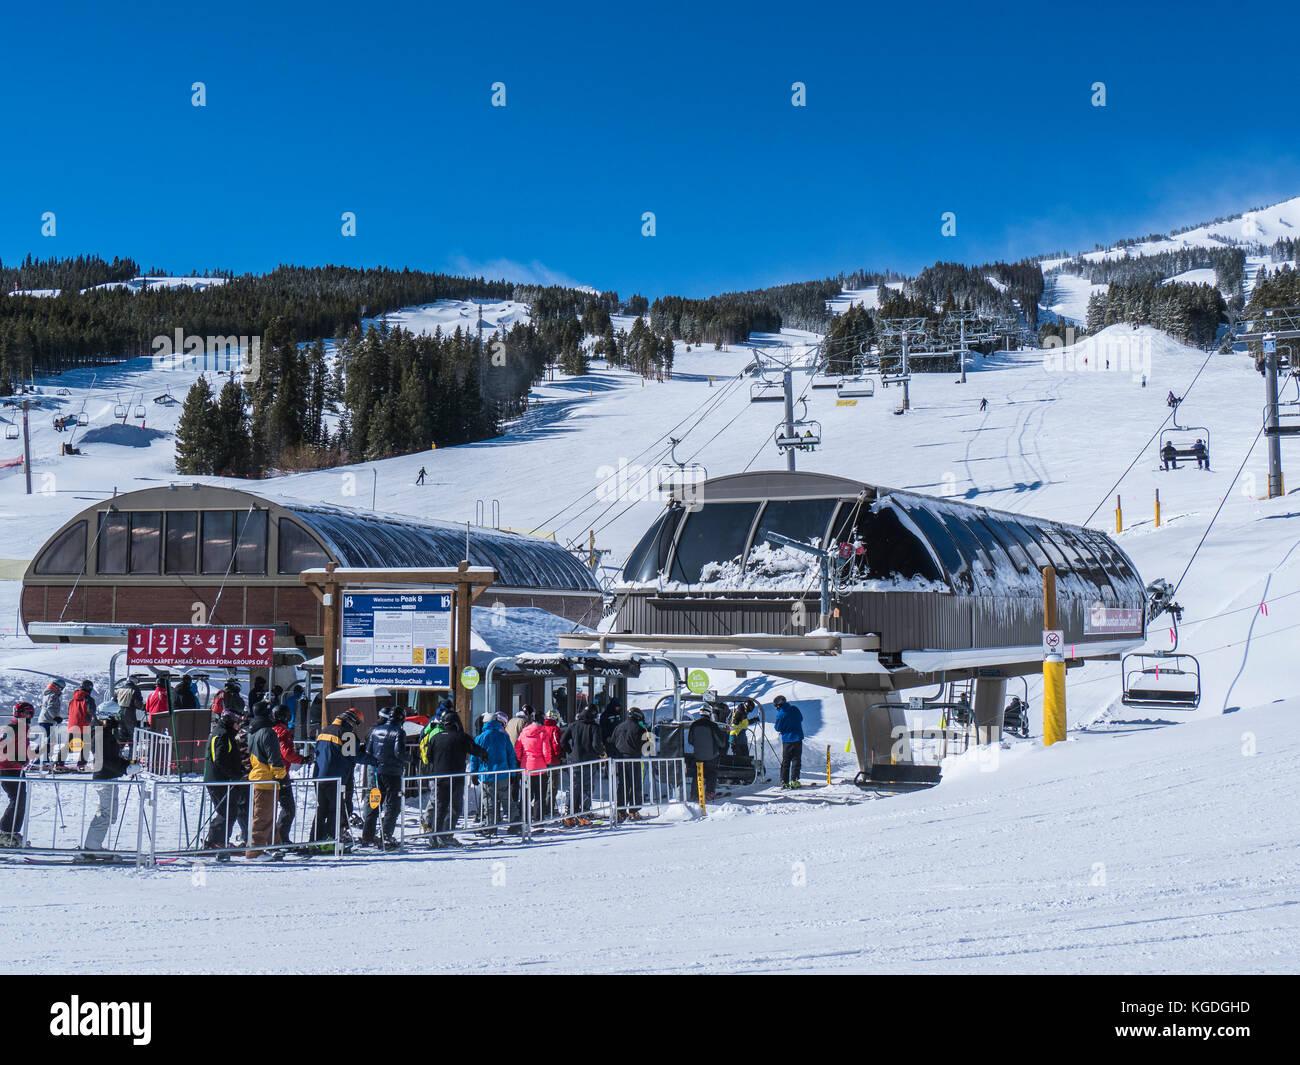 Chairlifts, Peak 8 Base, winter Breckenridge Ski Resort, Breckenridge, Colorado. - Stock Image